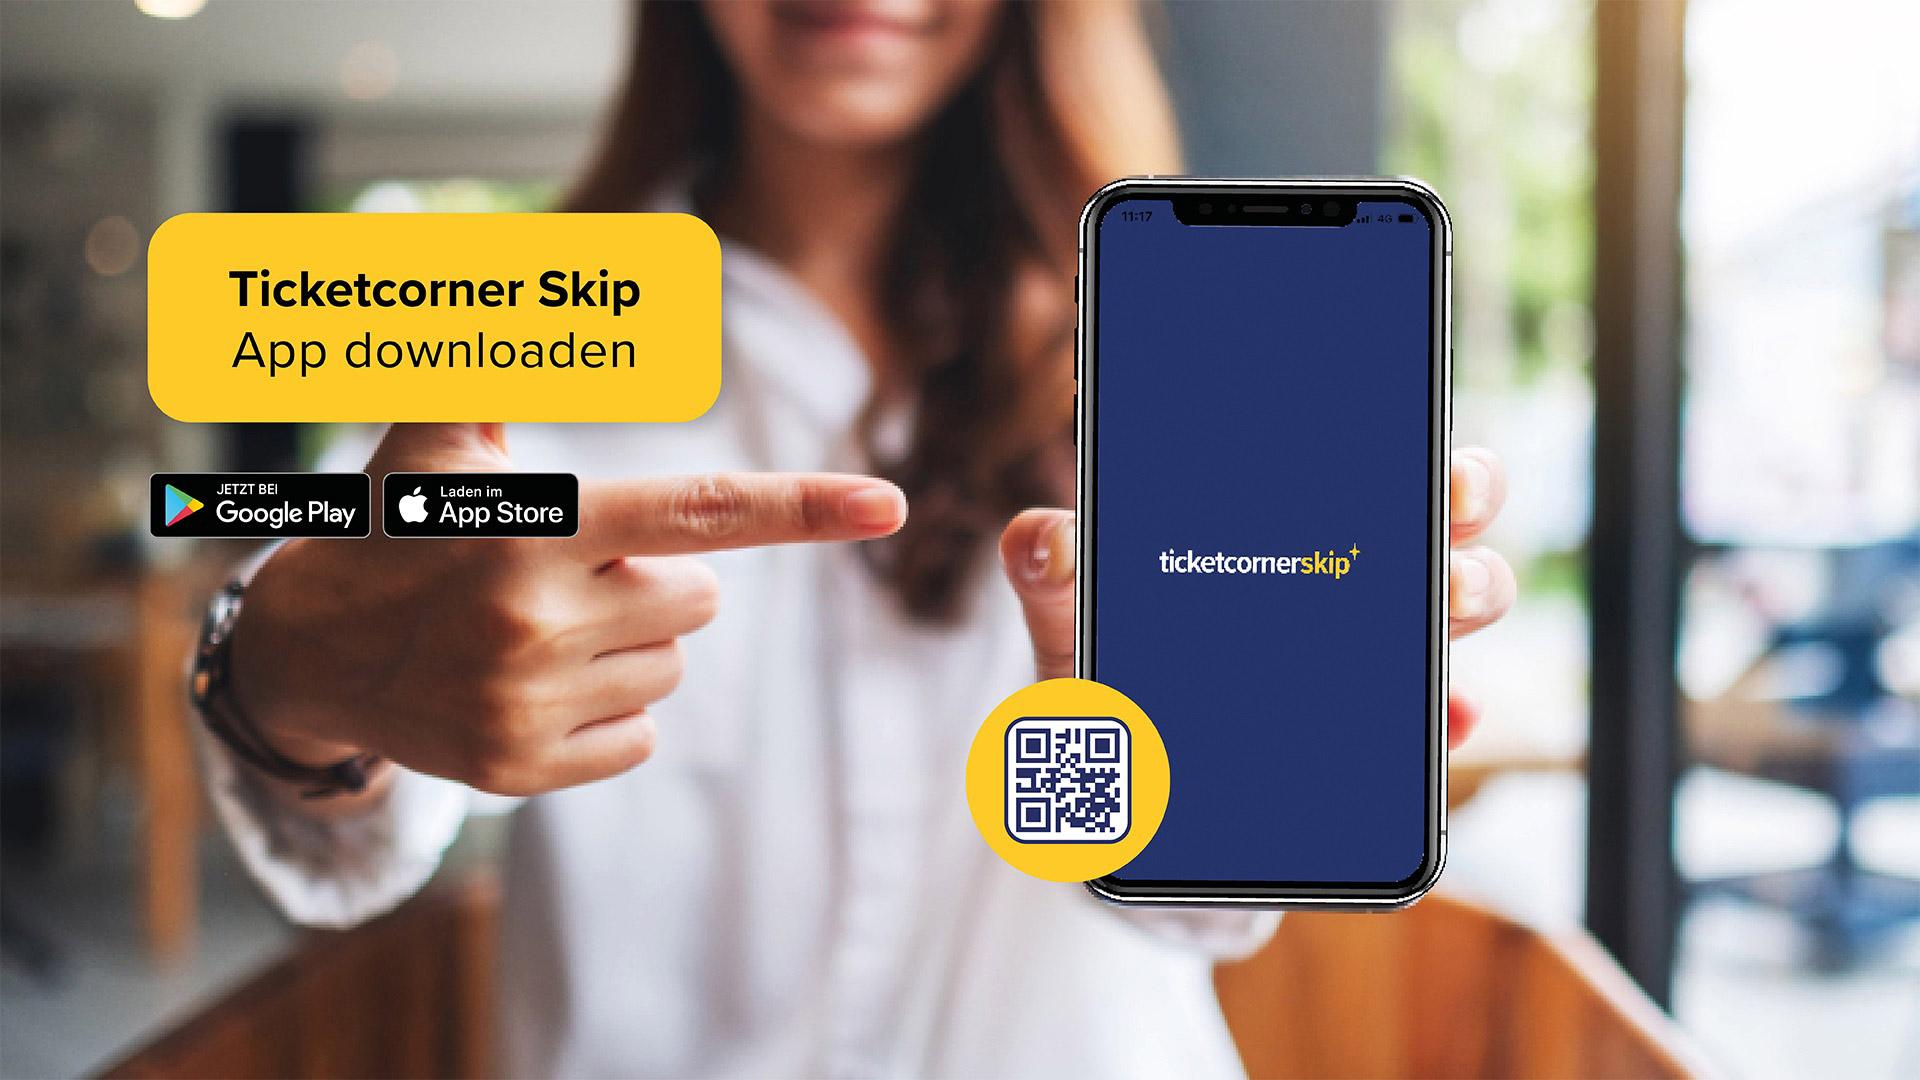 Ticketcorner Skip App